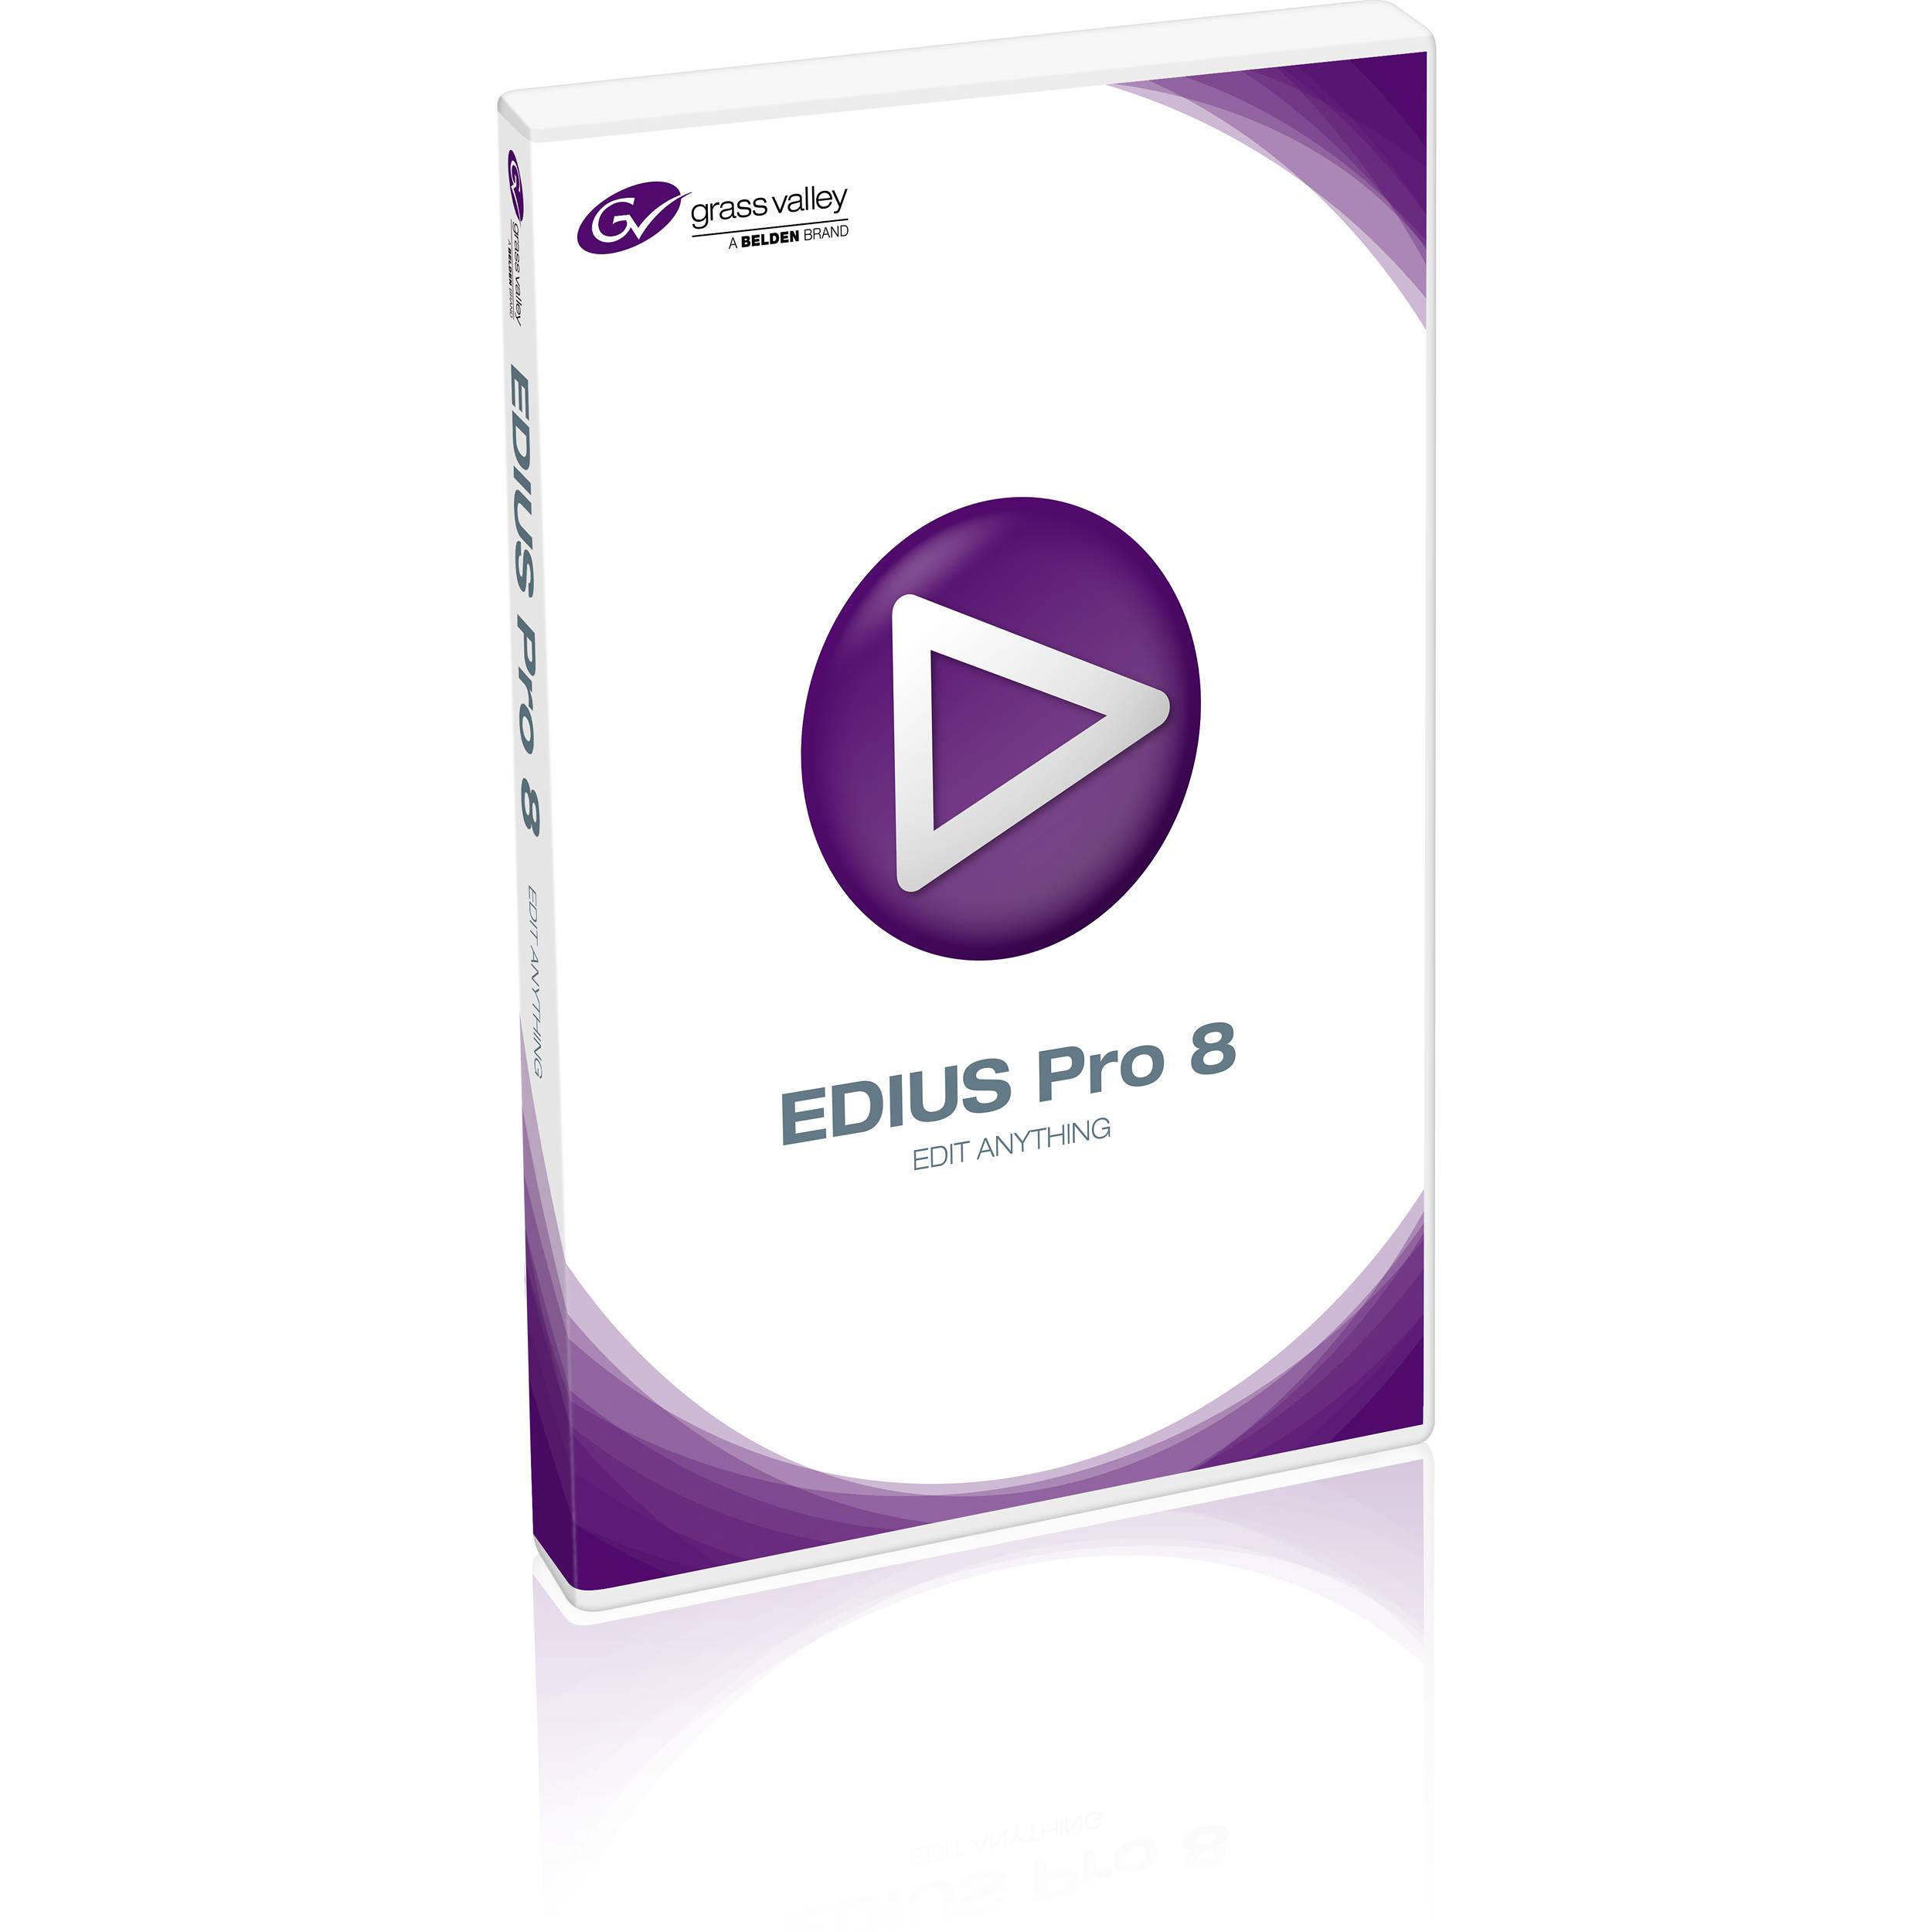 edius software download with keygen